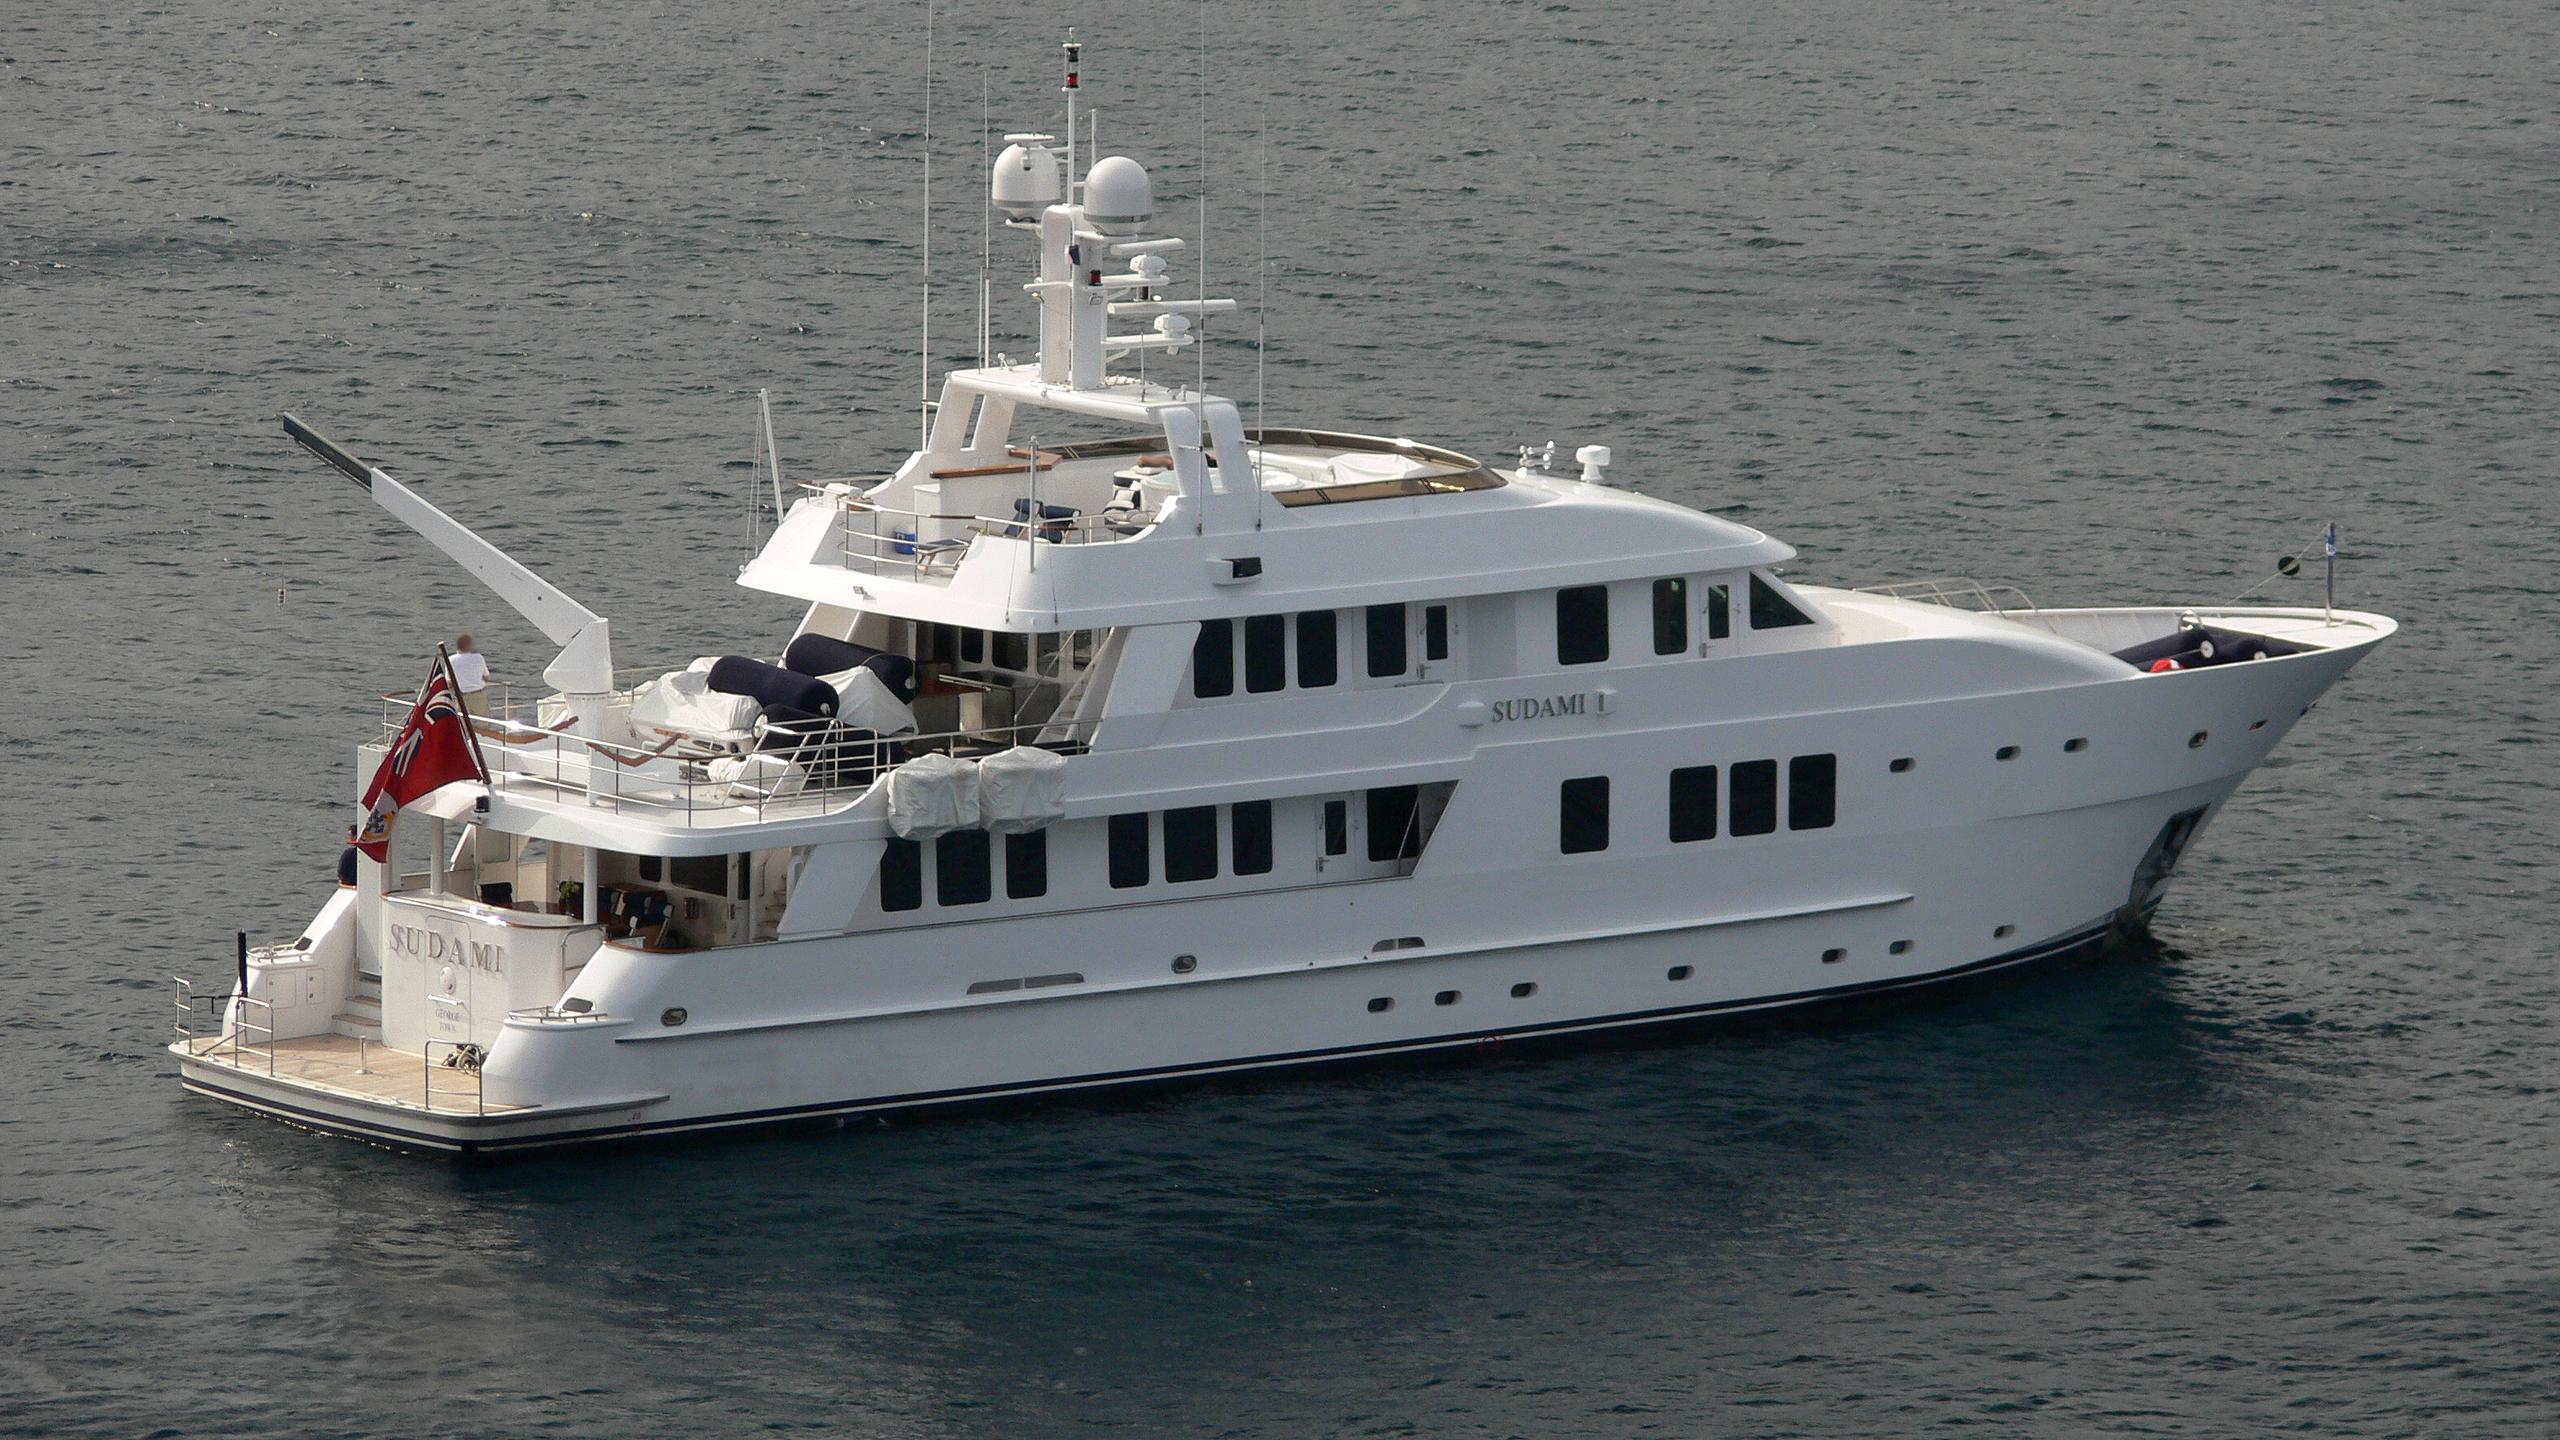 explorer-sudami-motor-yacht-inace-110-2007-34m-profile